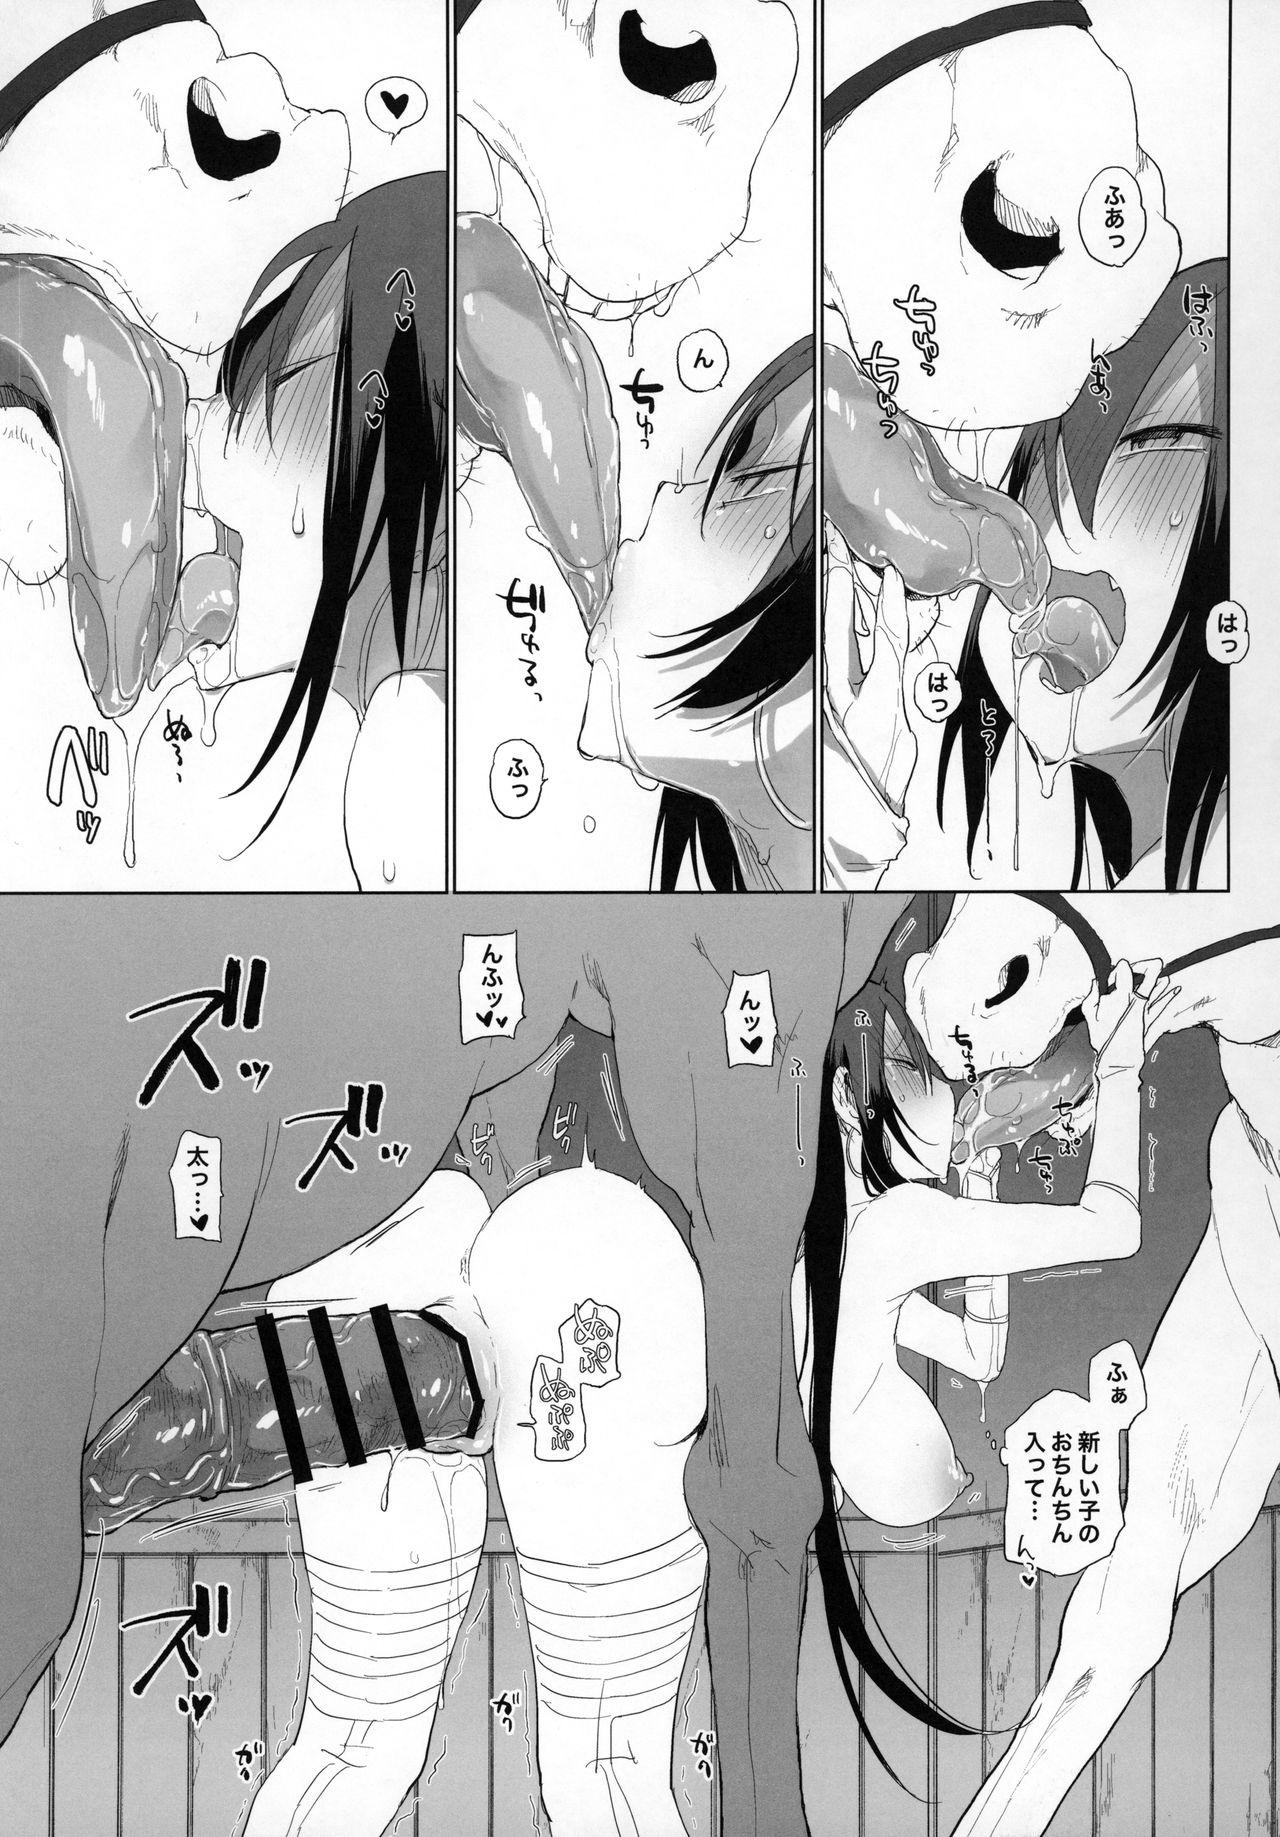 Sanzou-chan to Uma 3 7